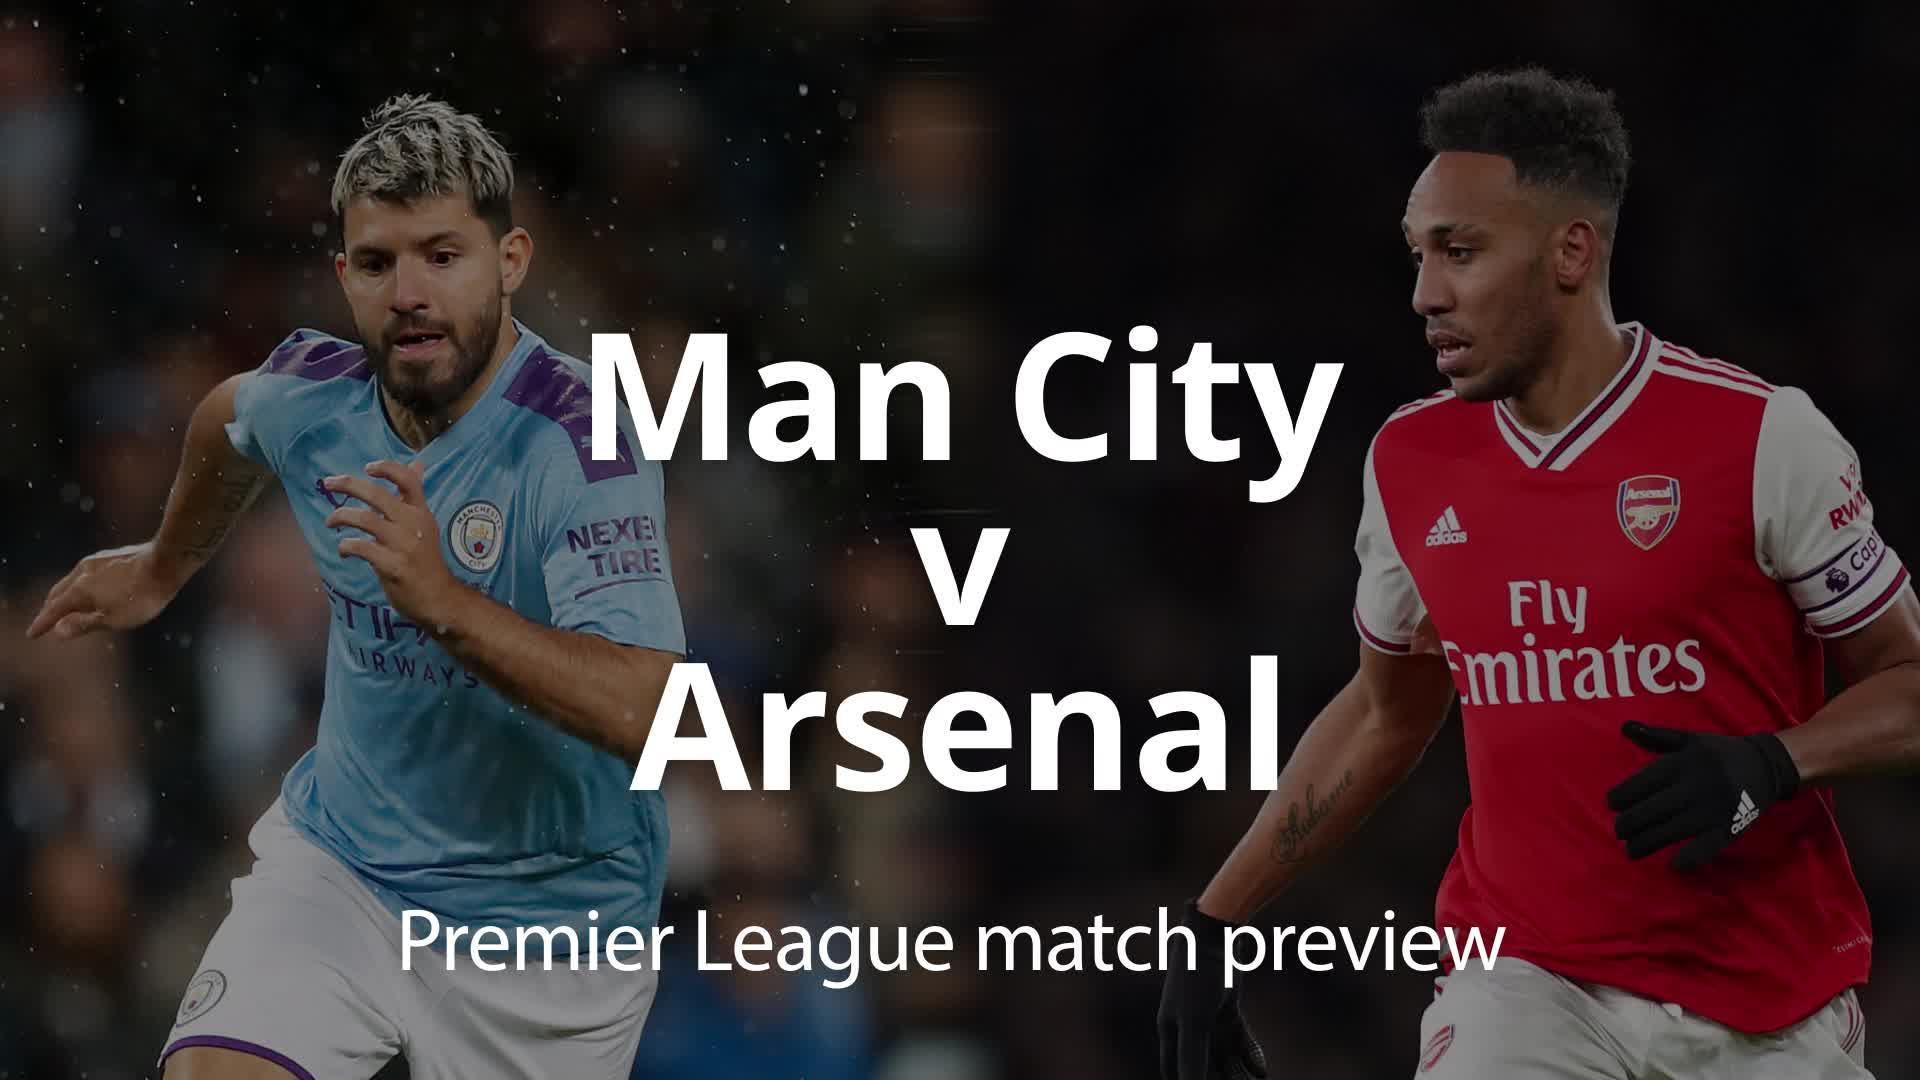 Premier League match preview: Man City v Arsenal